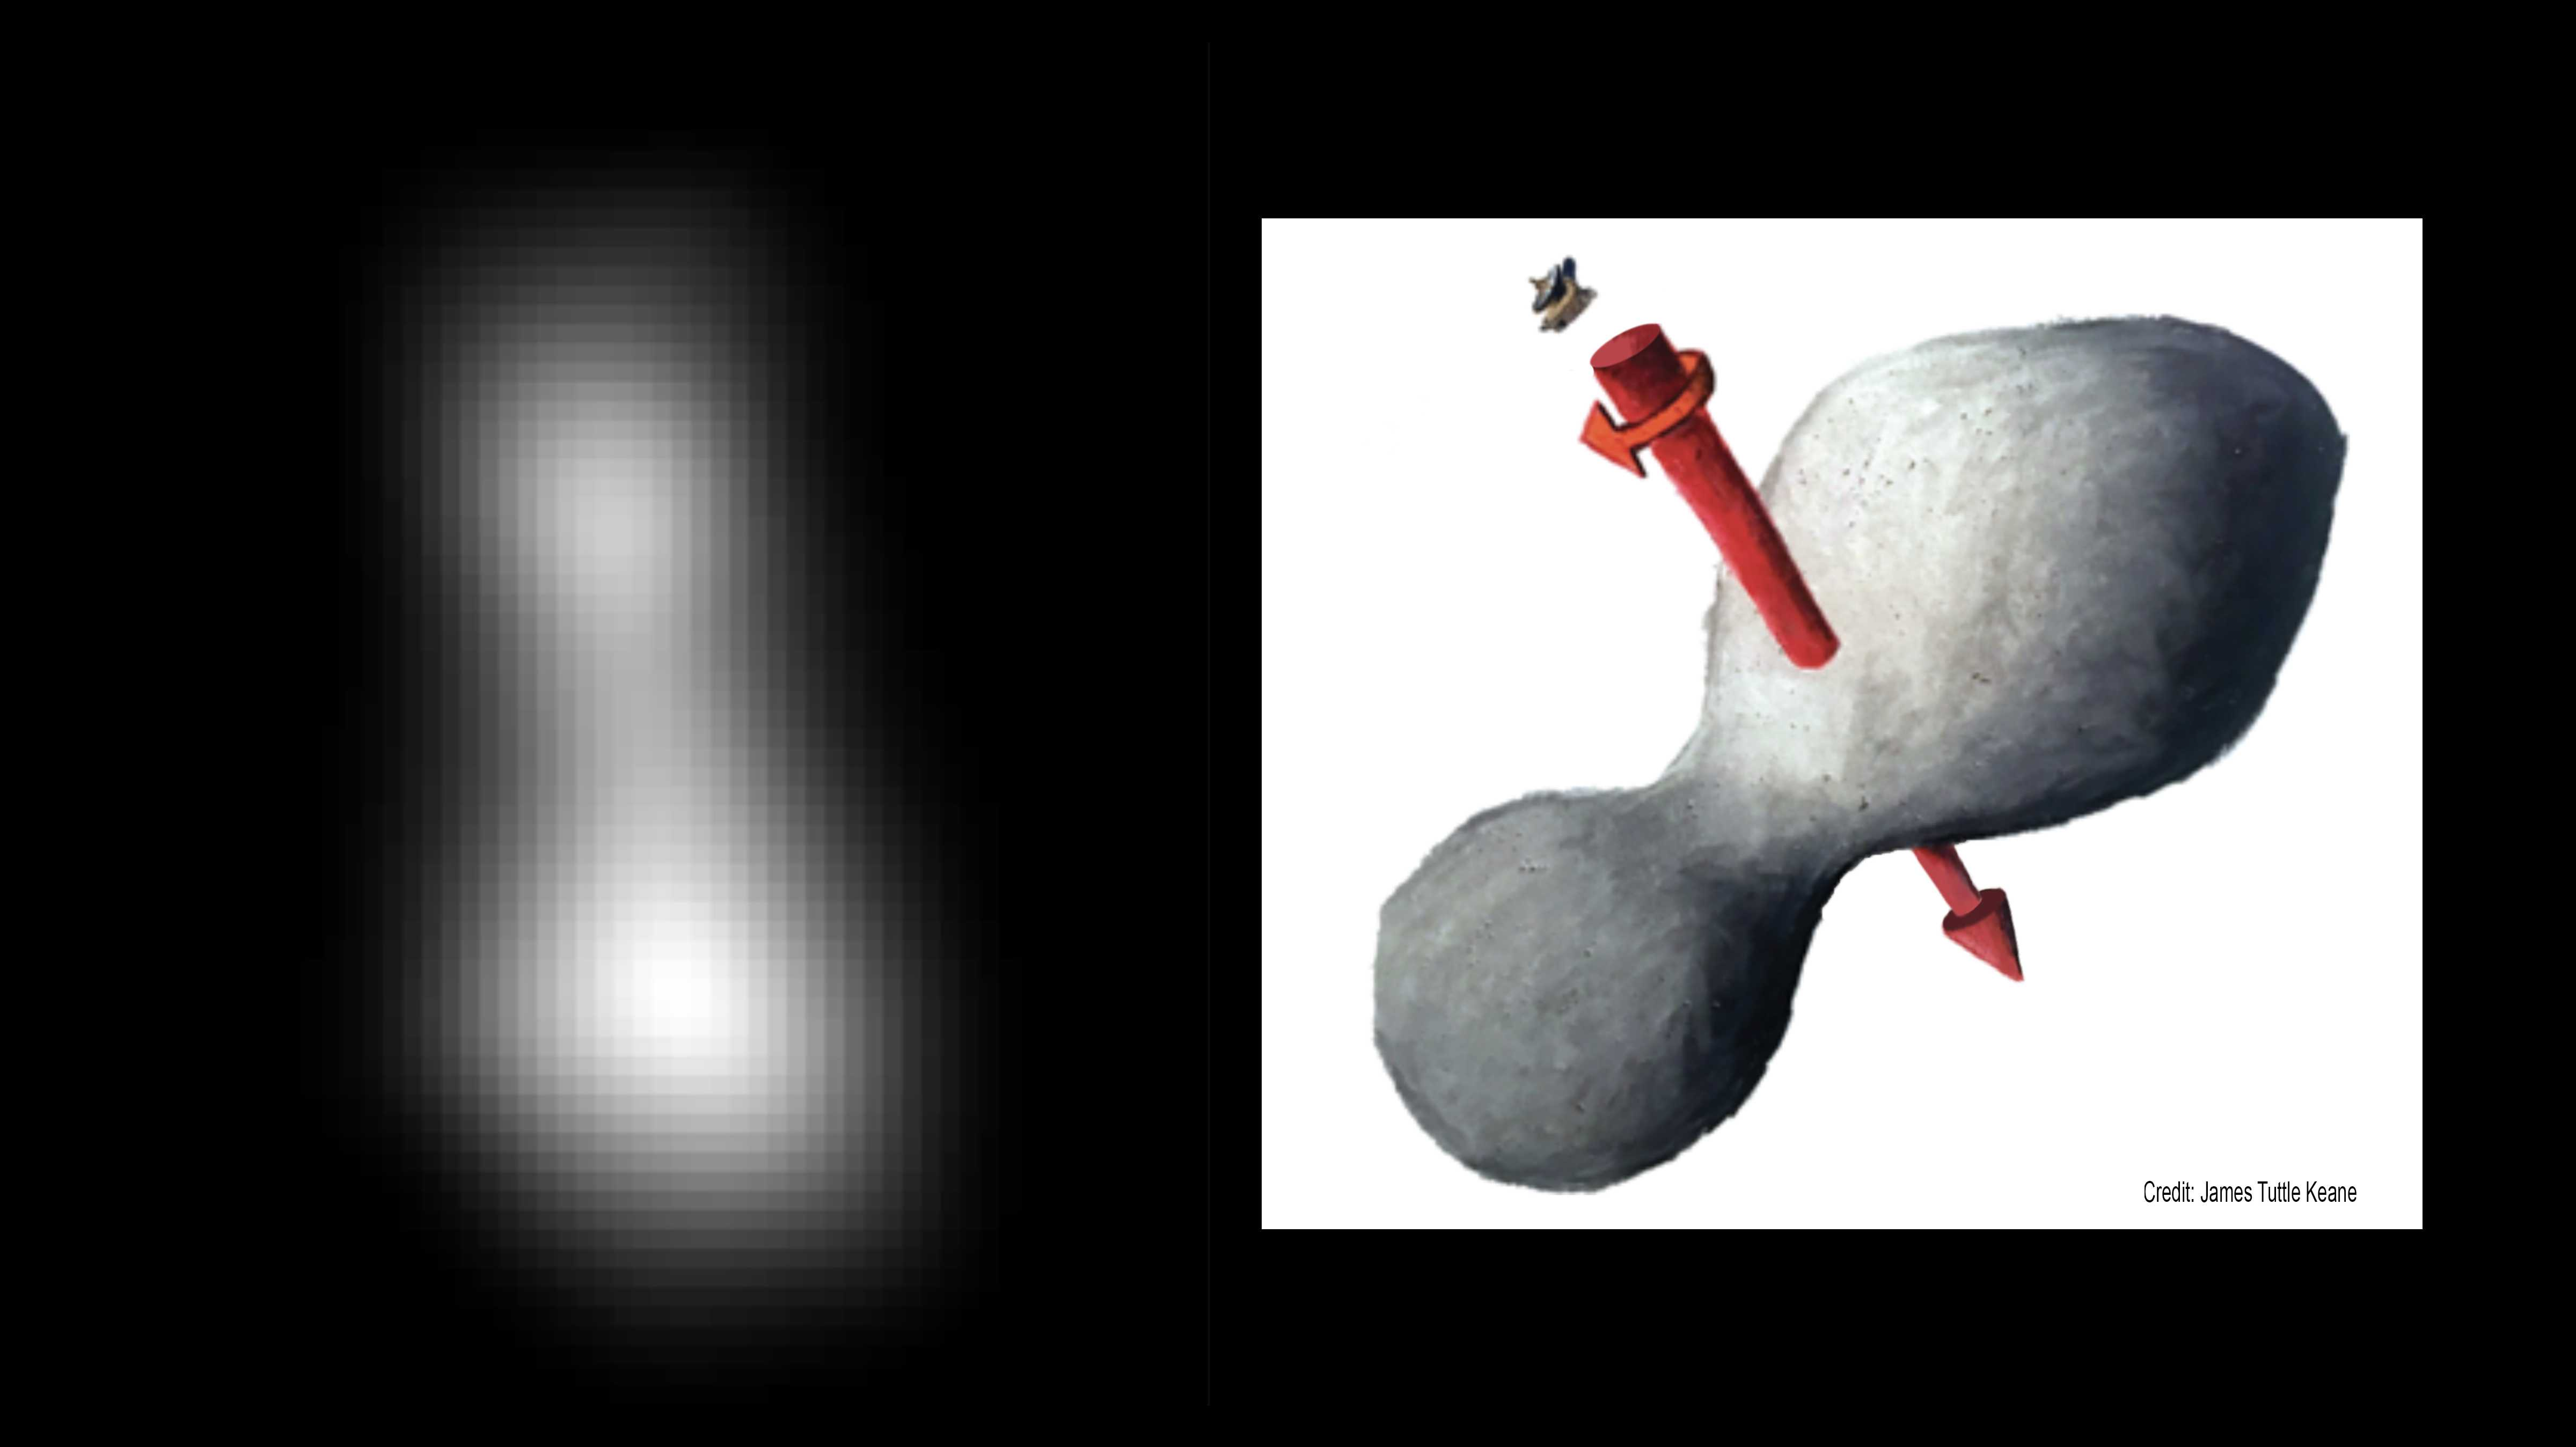 NASA-Sonde New Horizons: Vorbeiflug an Ultima Thule hat geklappt, erstes Rätsel gelöst